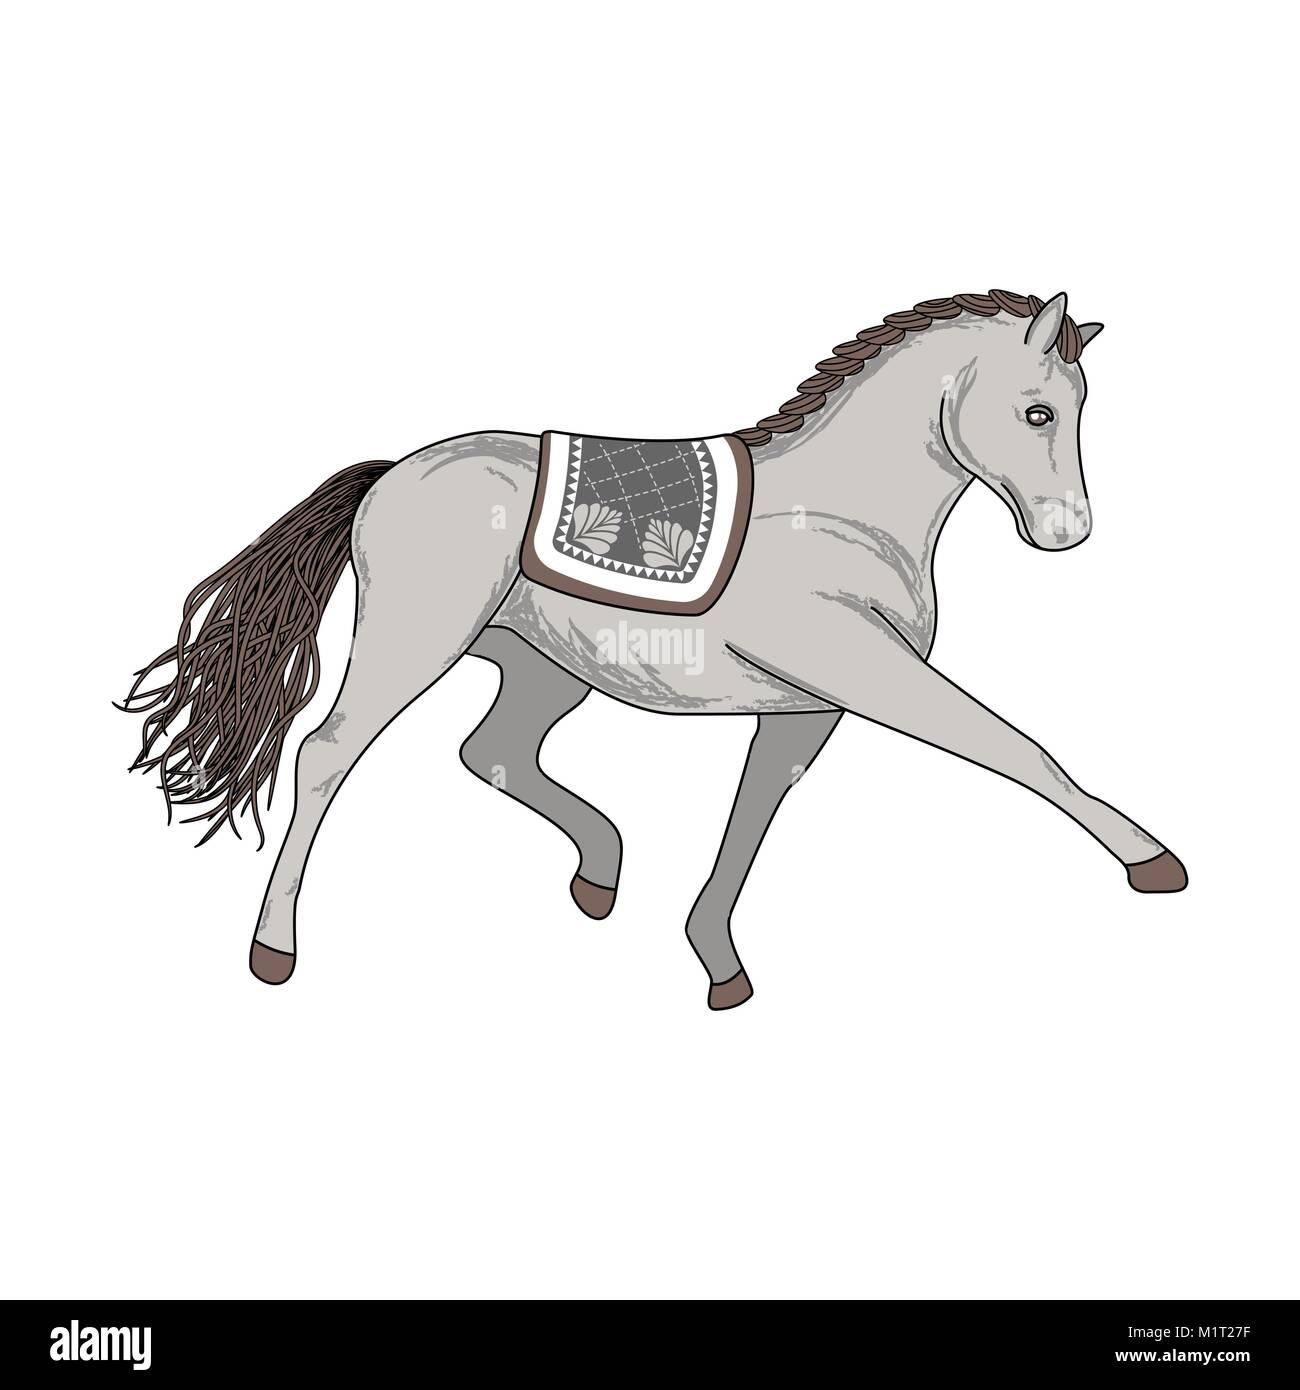 Dressage horse vector illustration. - Stock Image